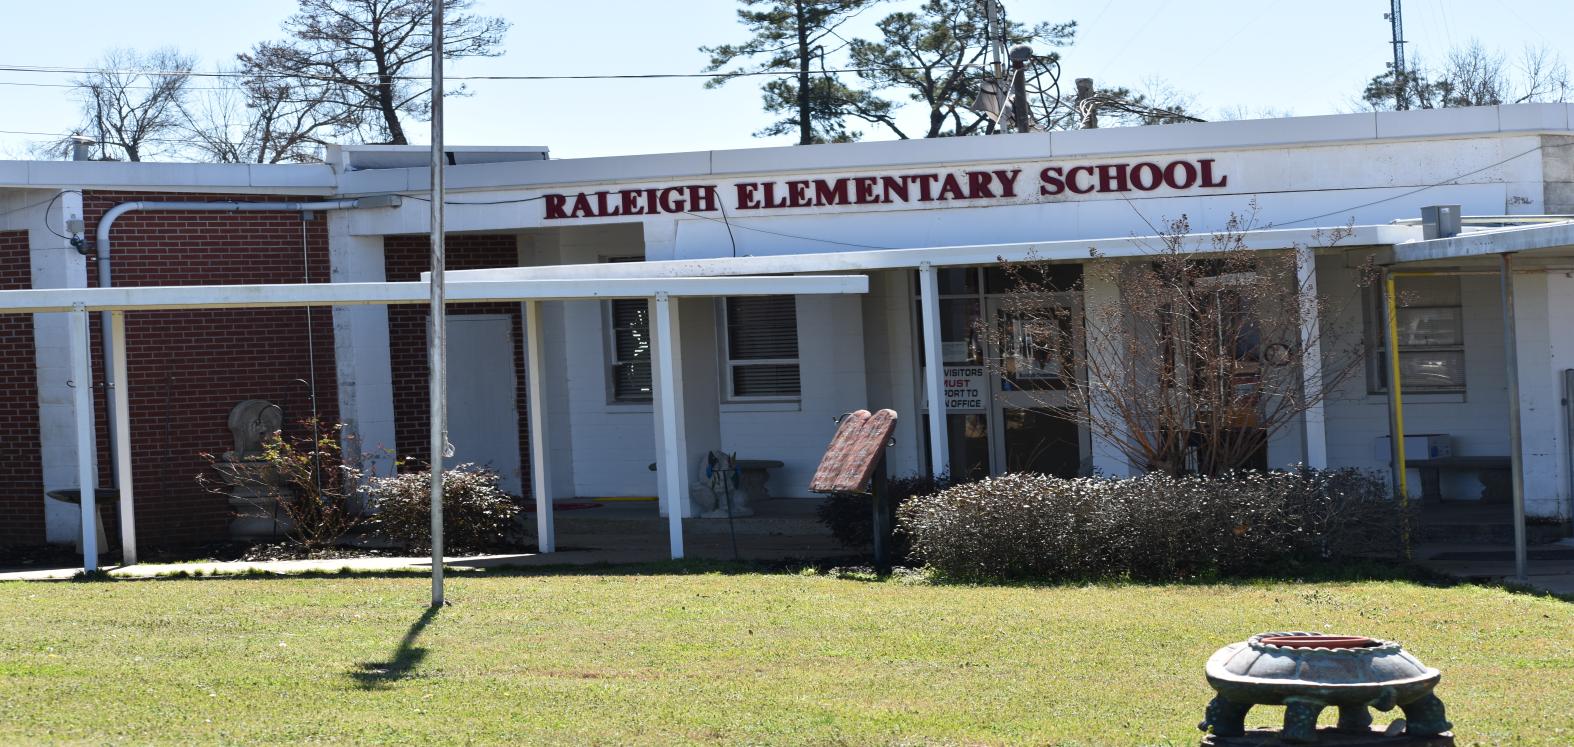 Raleigh Elementary